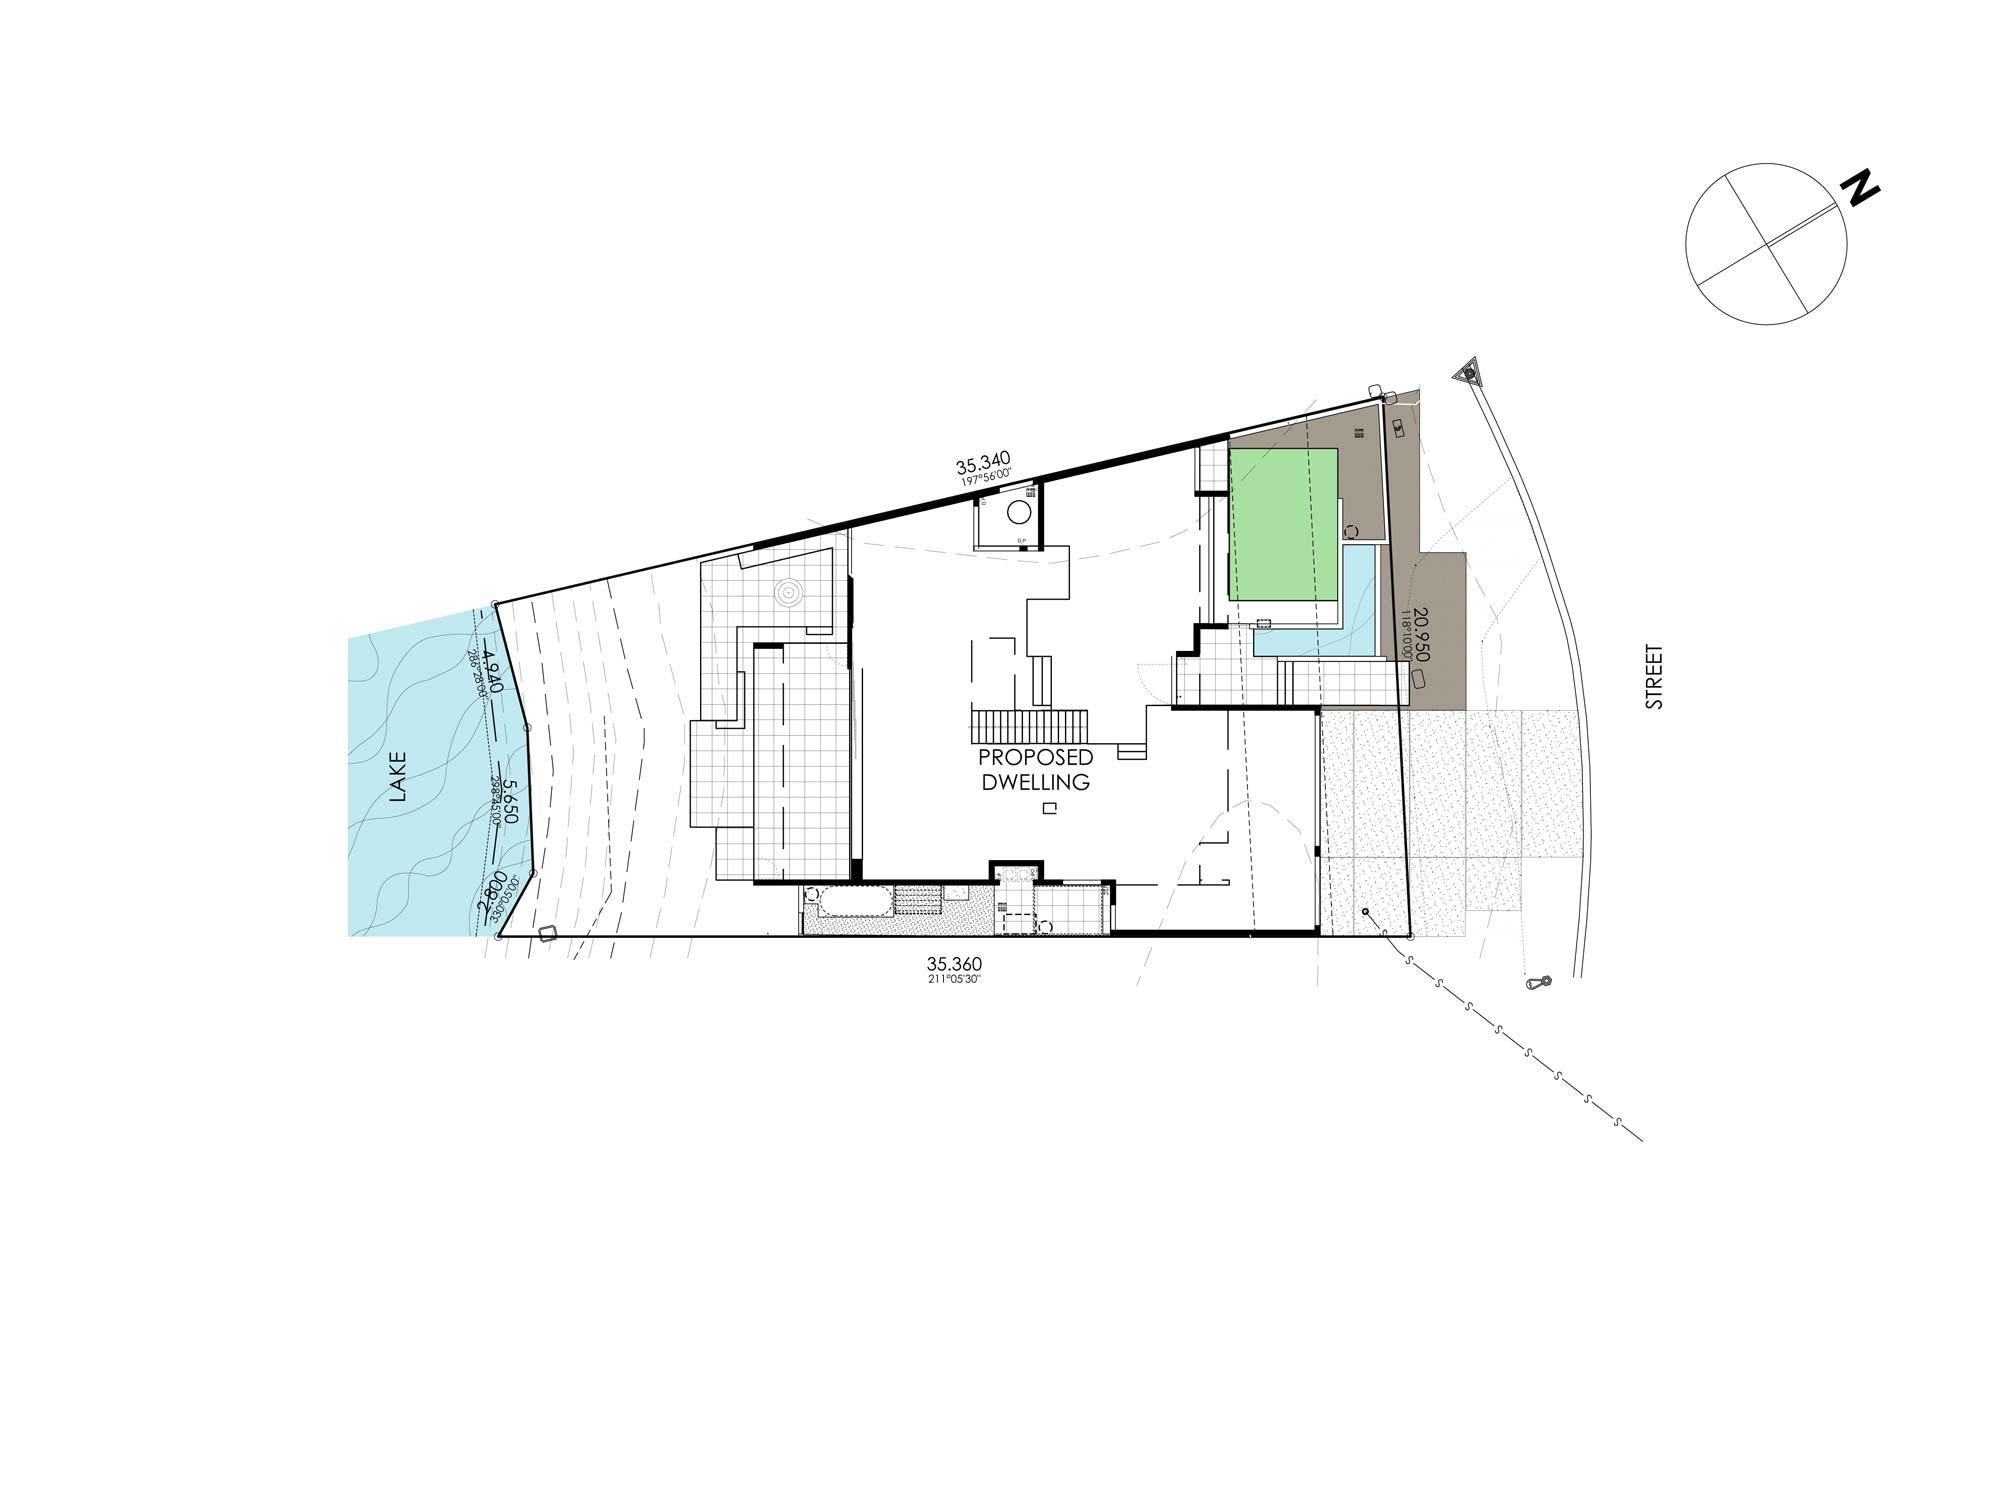 phillips site plan